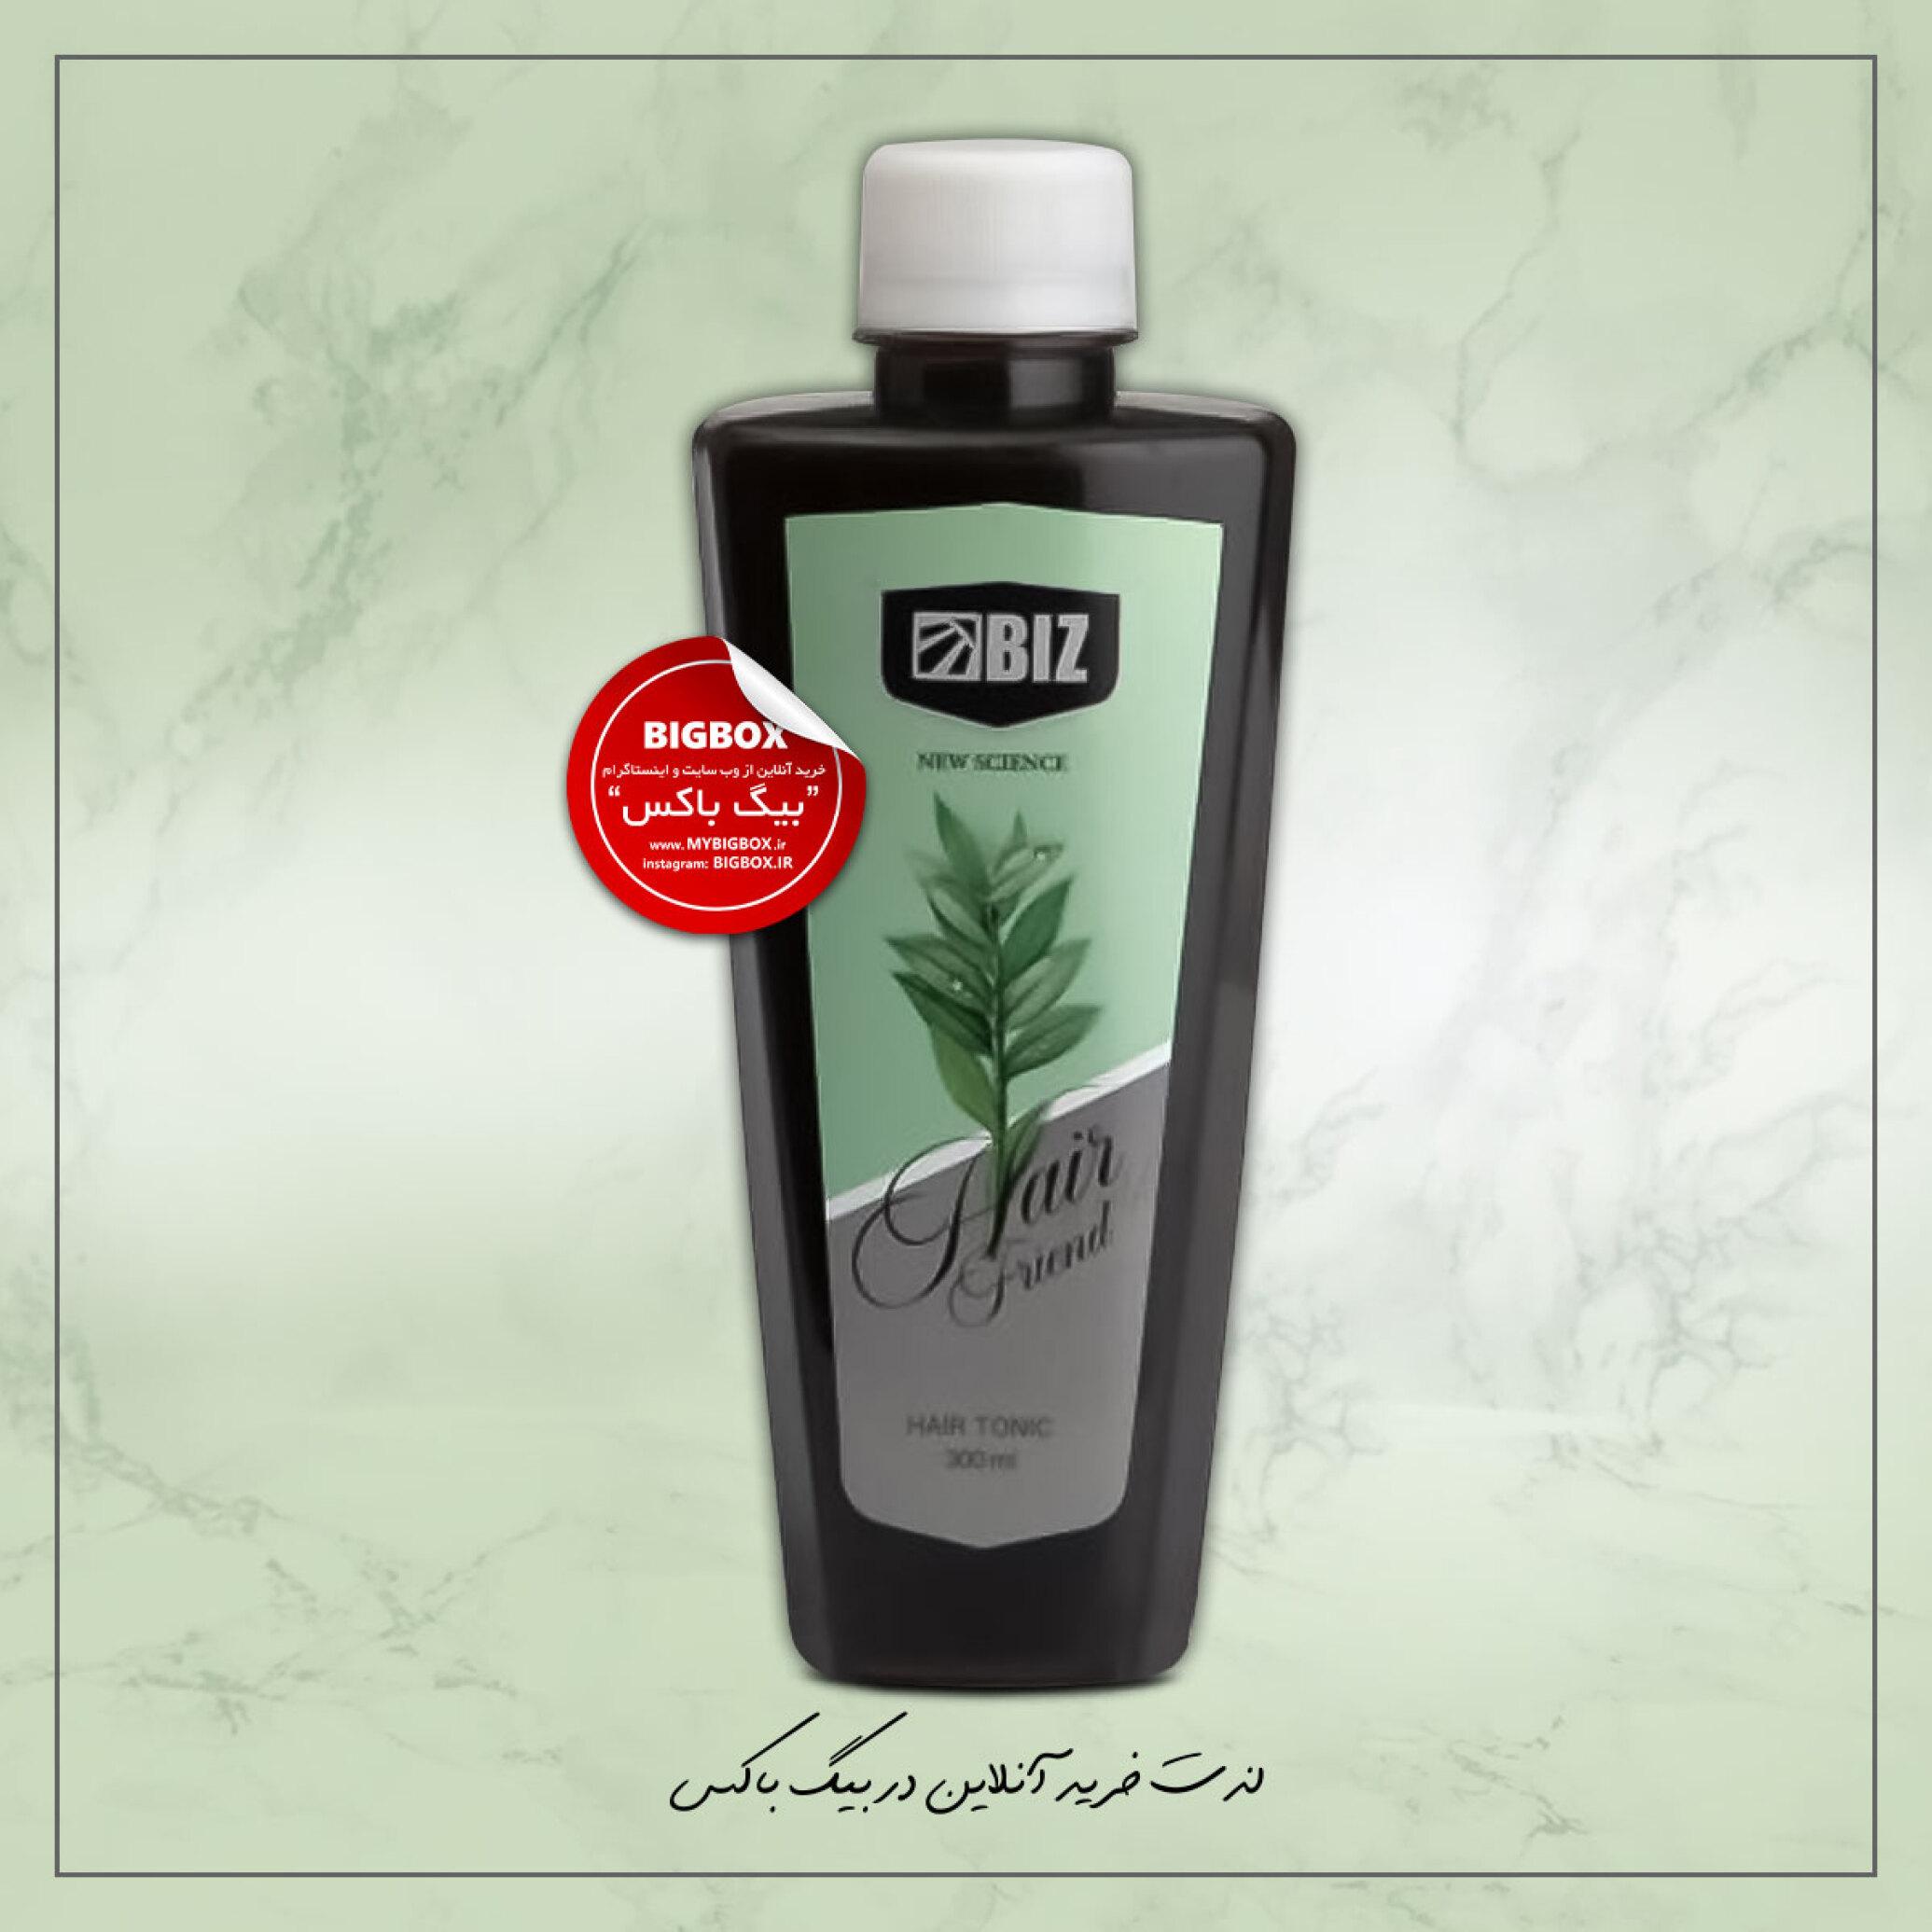 تونیک تقویت کننده مو ۱۰۰% گیاهی بیز مدل Hair Friend حجم 300 میلی لیتر